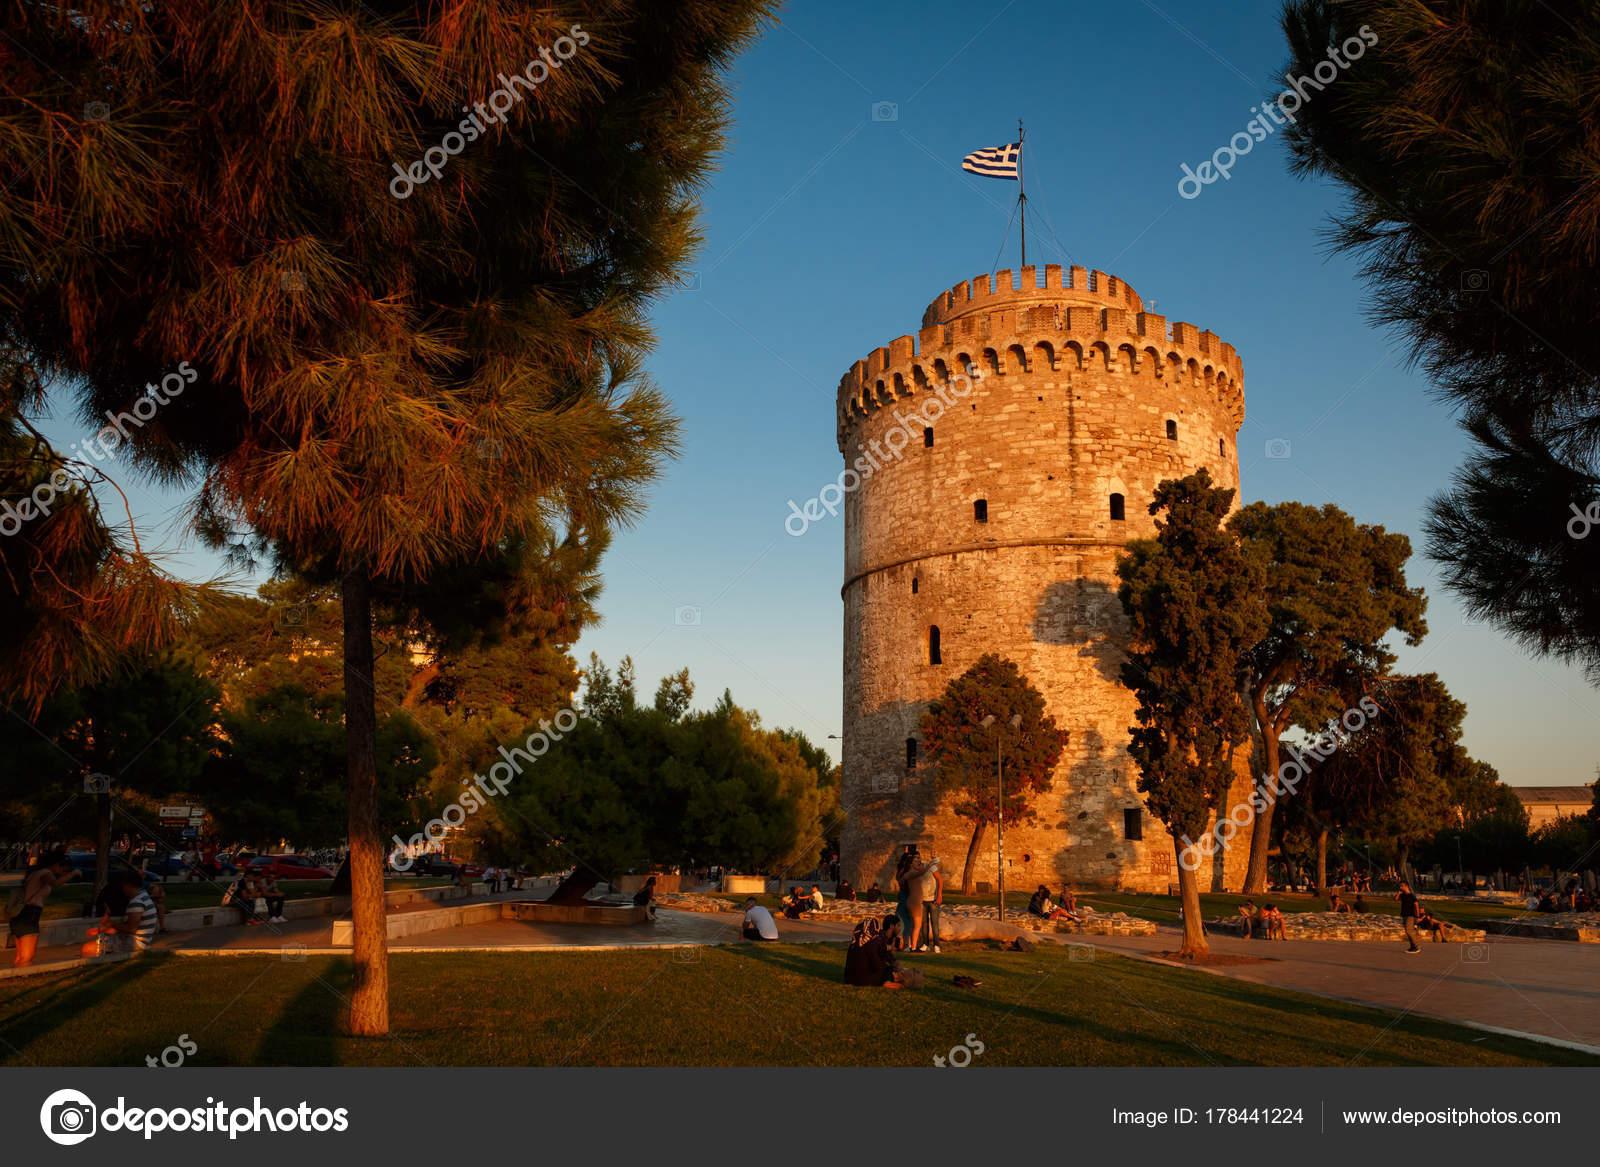 Thessaloniki dating site